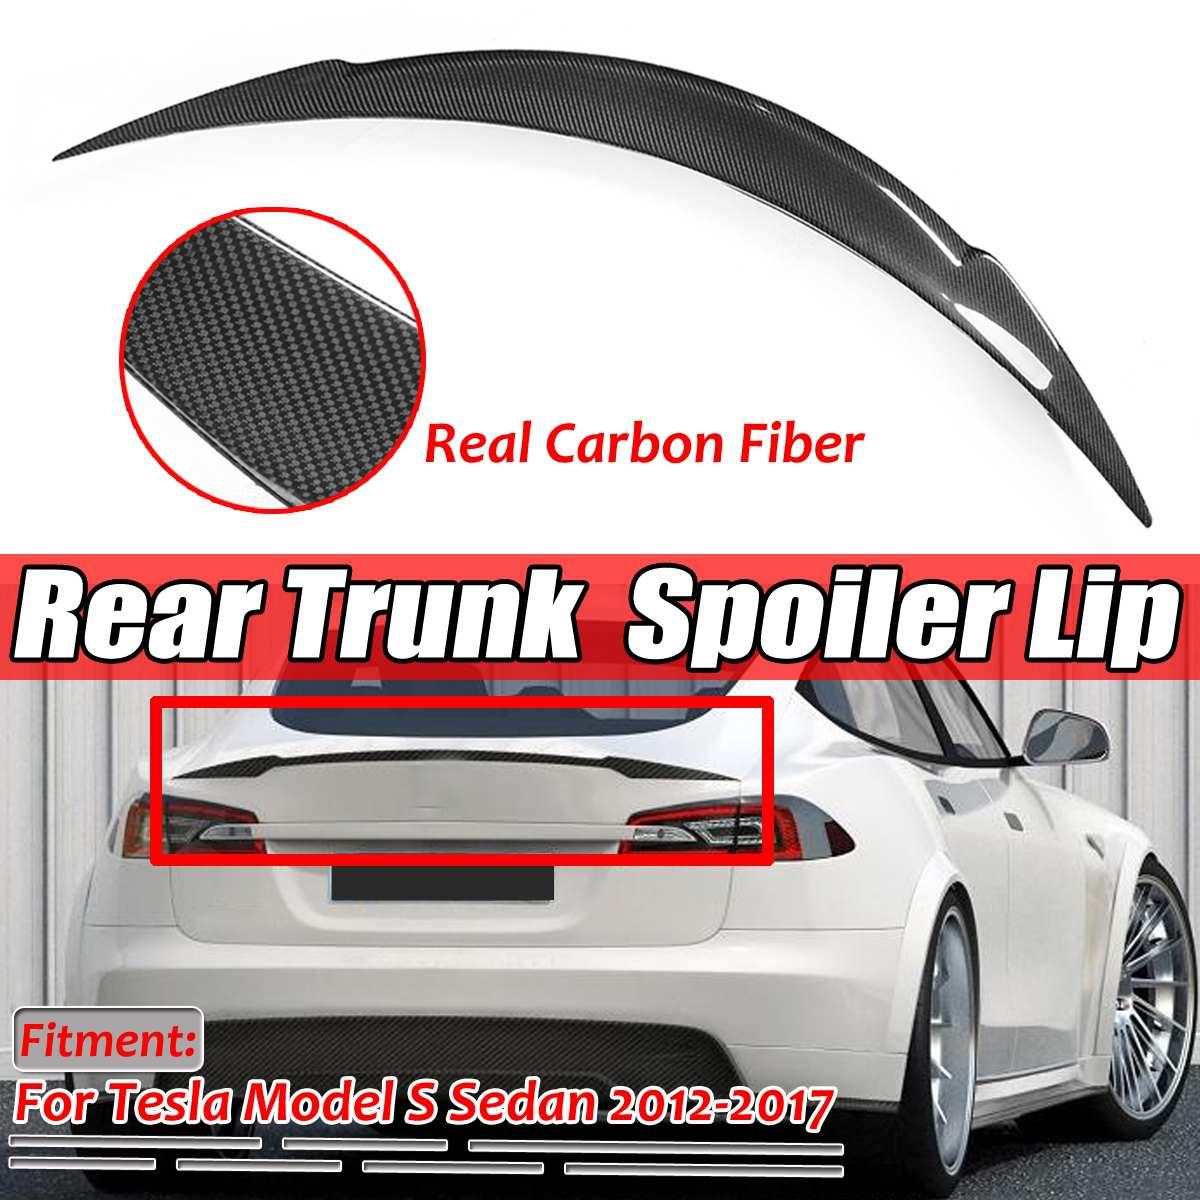 Nuevo maletero trasero de fibra de carbono Real labio alerón ala grande para Tesla modelo S Sedan 2012-2019 alerón de Ala